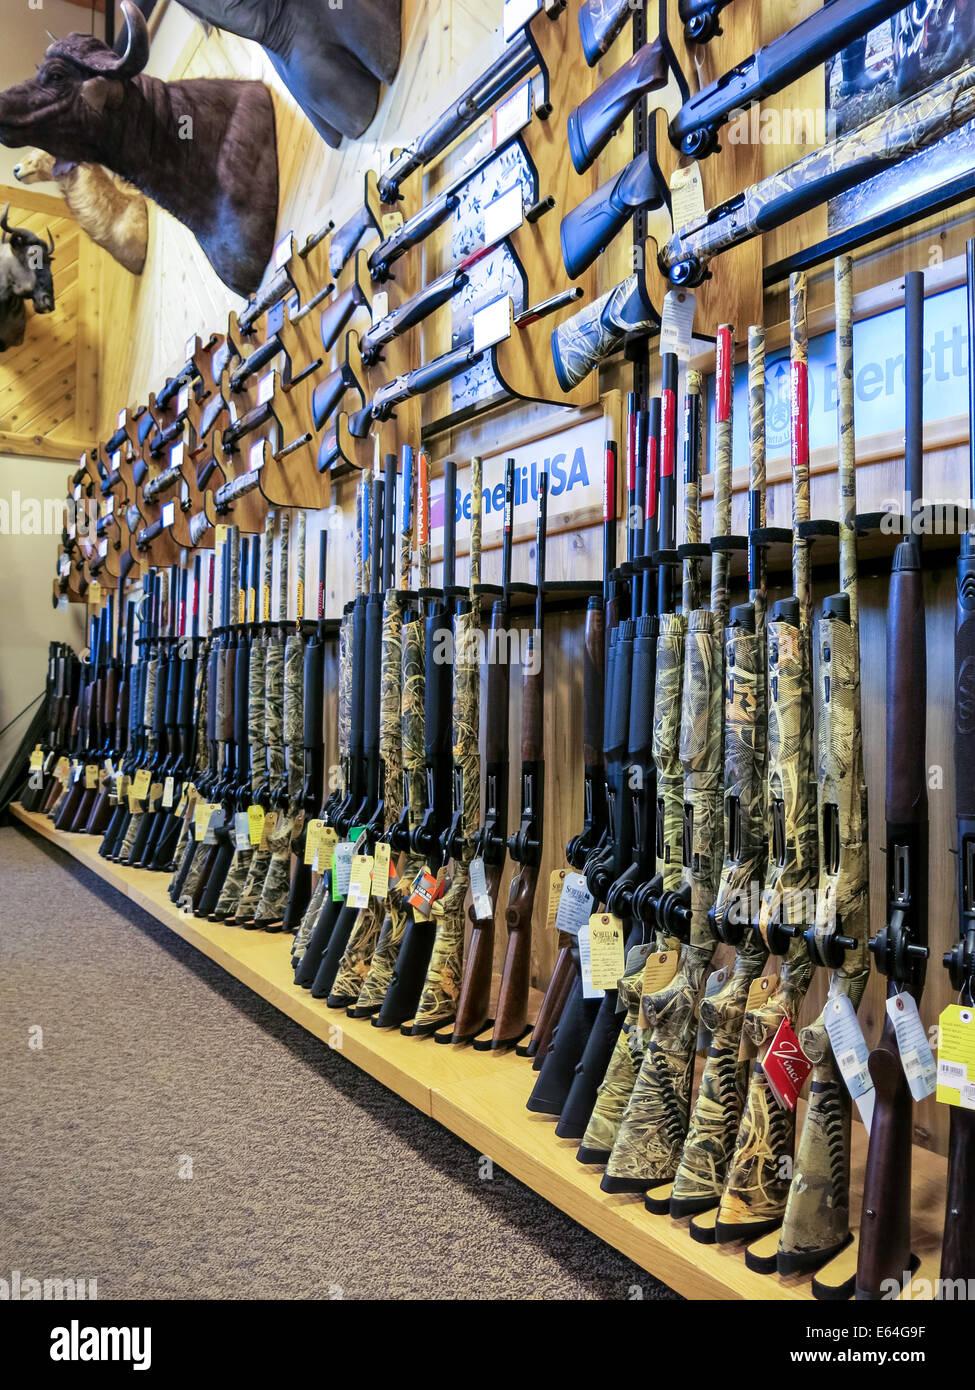 Hunting Rifles, Scheels Sporting Goods Store, Great Falls